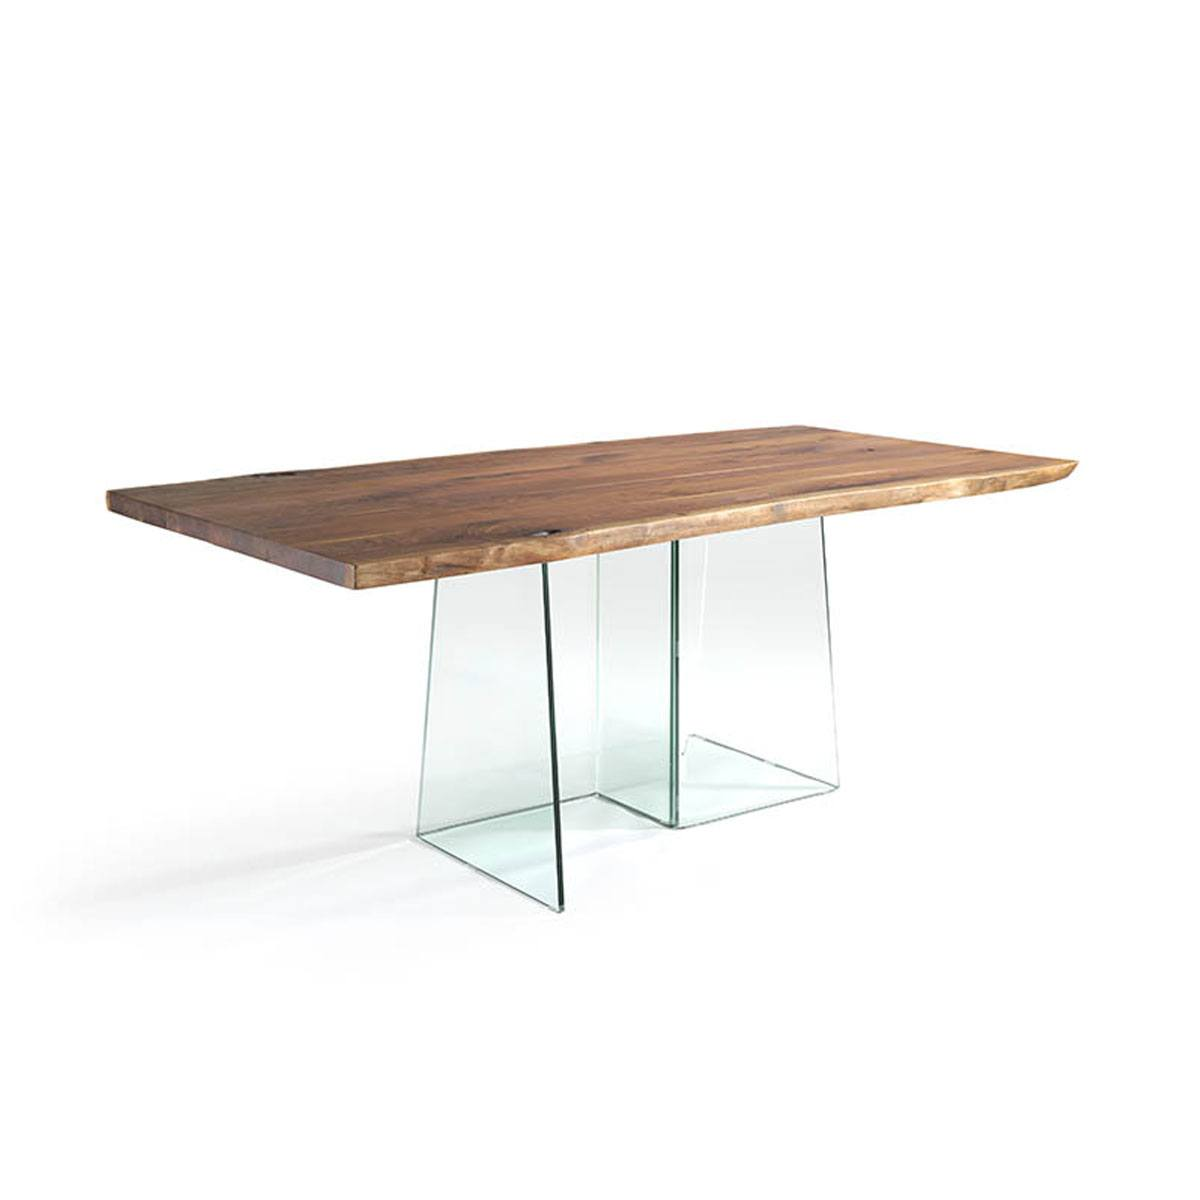 Mesa de comedor fresno o nogal 200cm Vida Comprar mesas de comedor